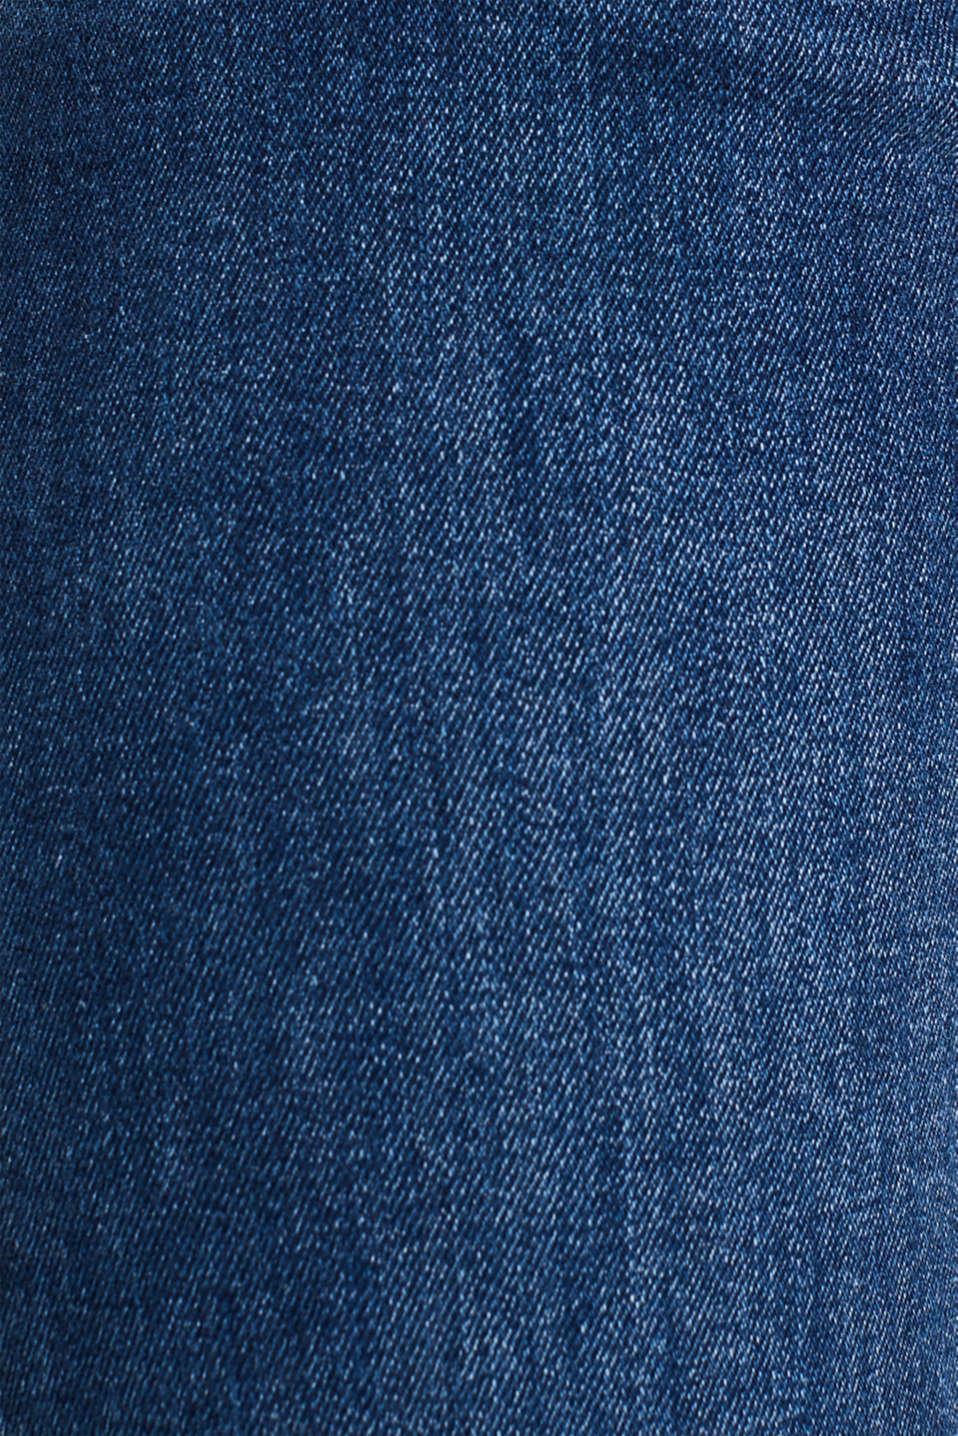 Pants denim Slim fit, BLUE MEDIUM WASH, detail image number 4